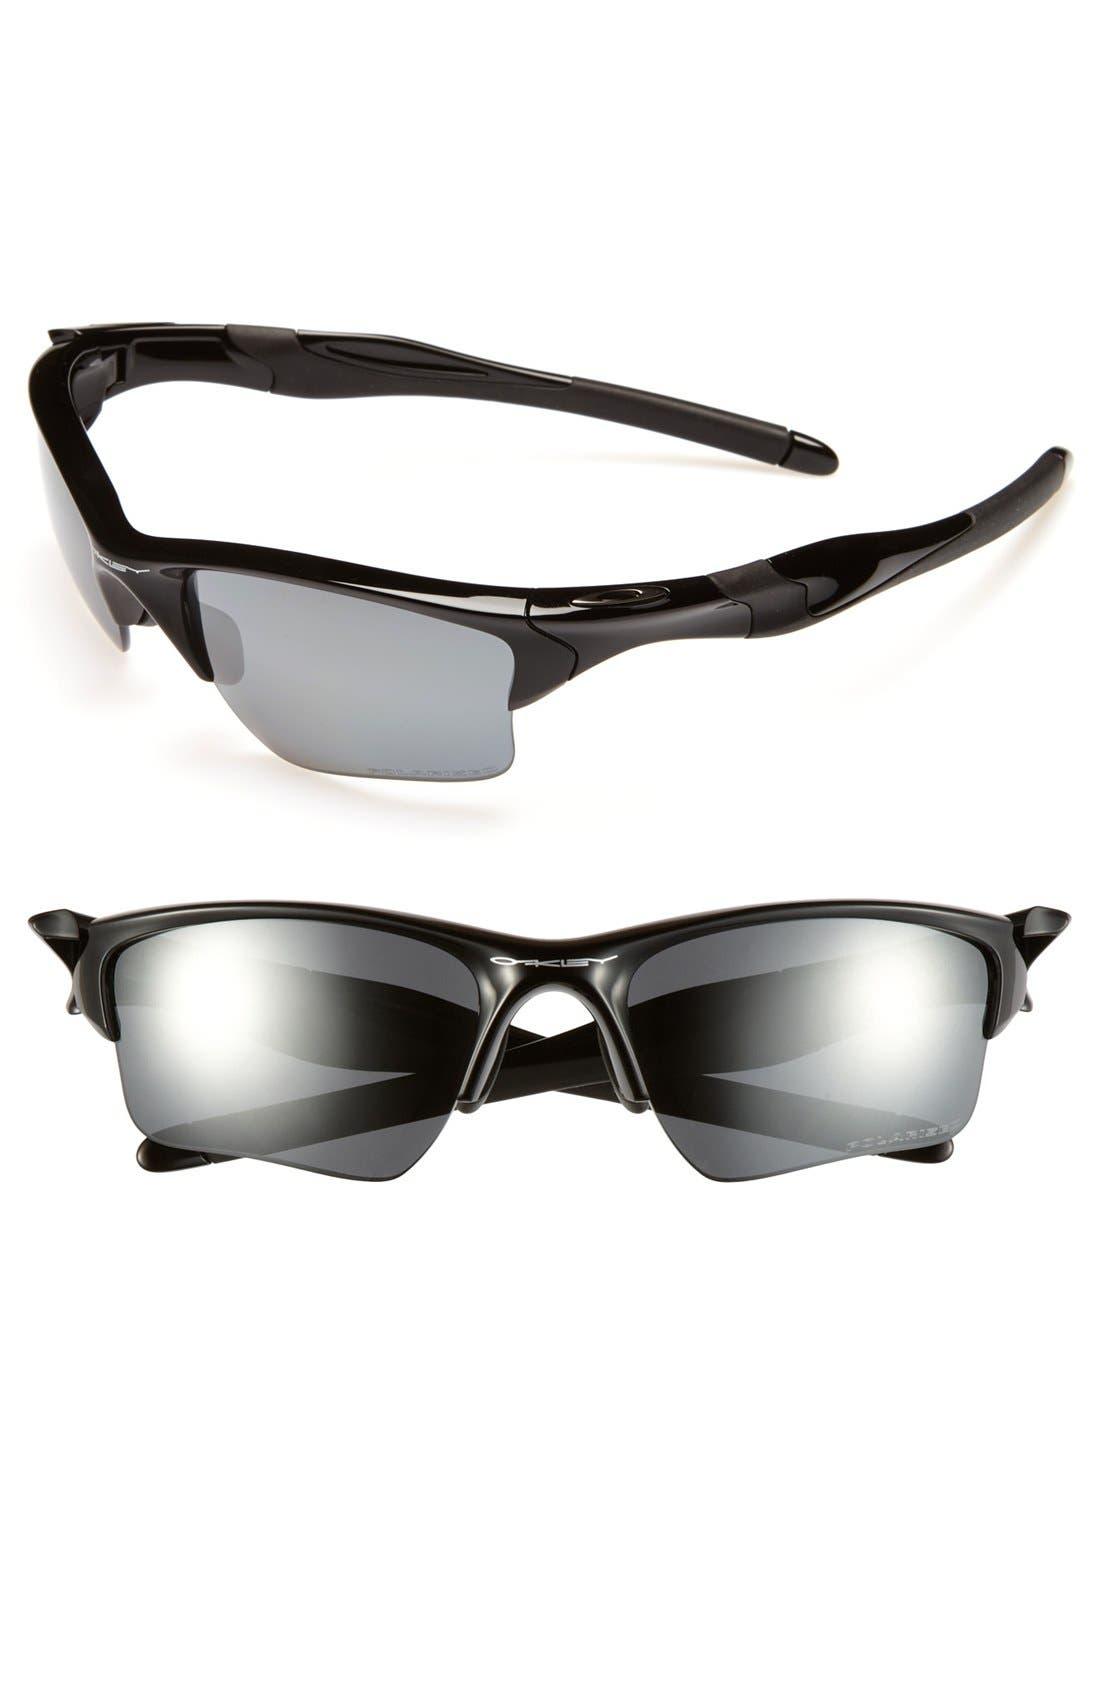 Alternate Image 1 Selected - Oakley 'Half Jacket 2.0 XL' 62mm Polarized Sunglasses